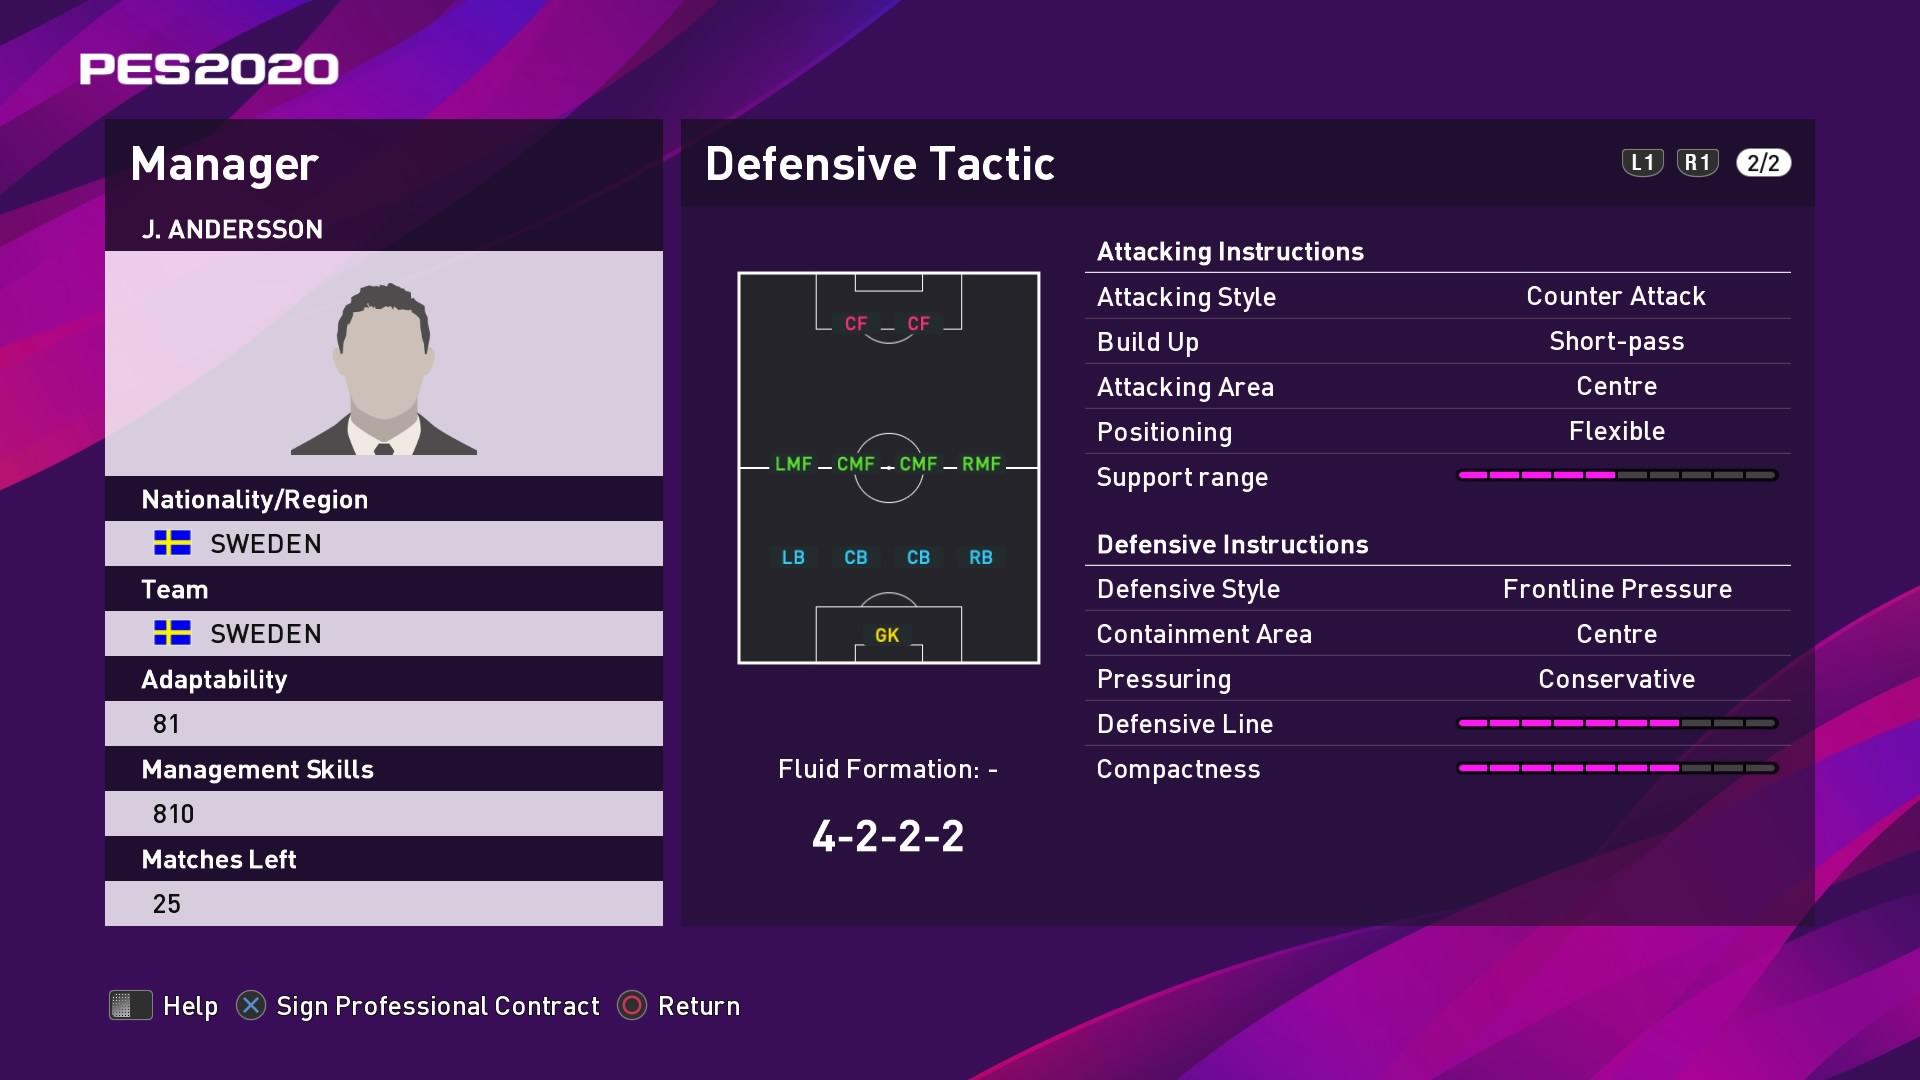 J. Andersson (Janne Andersson) Defensive Tactic in PES 2020 myClub